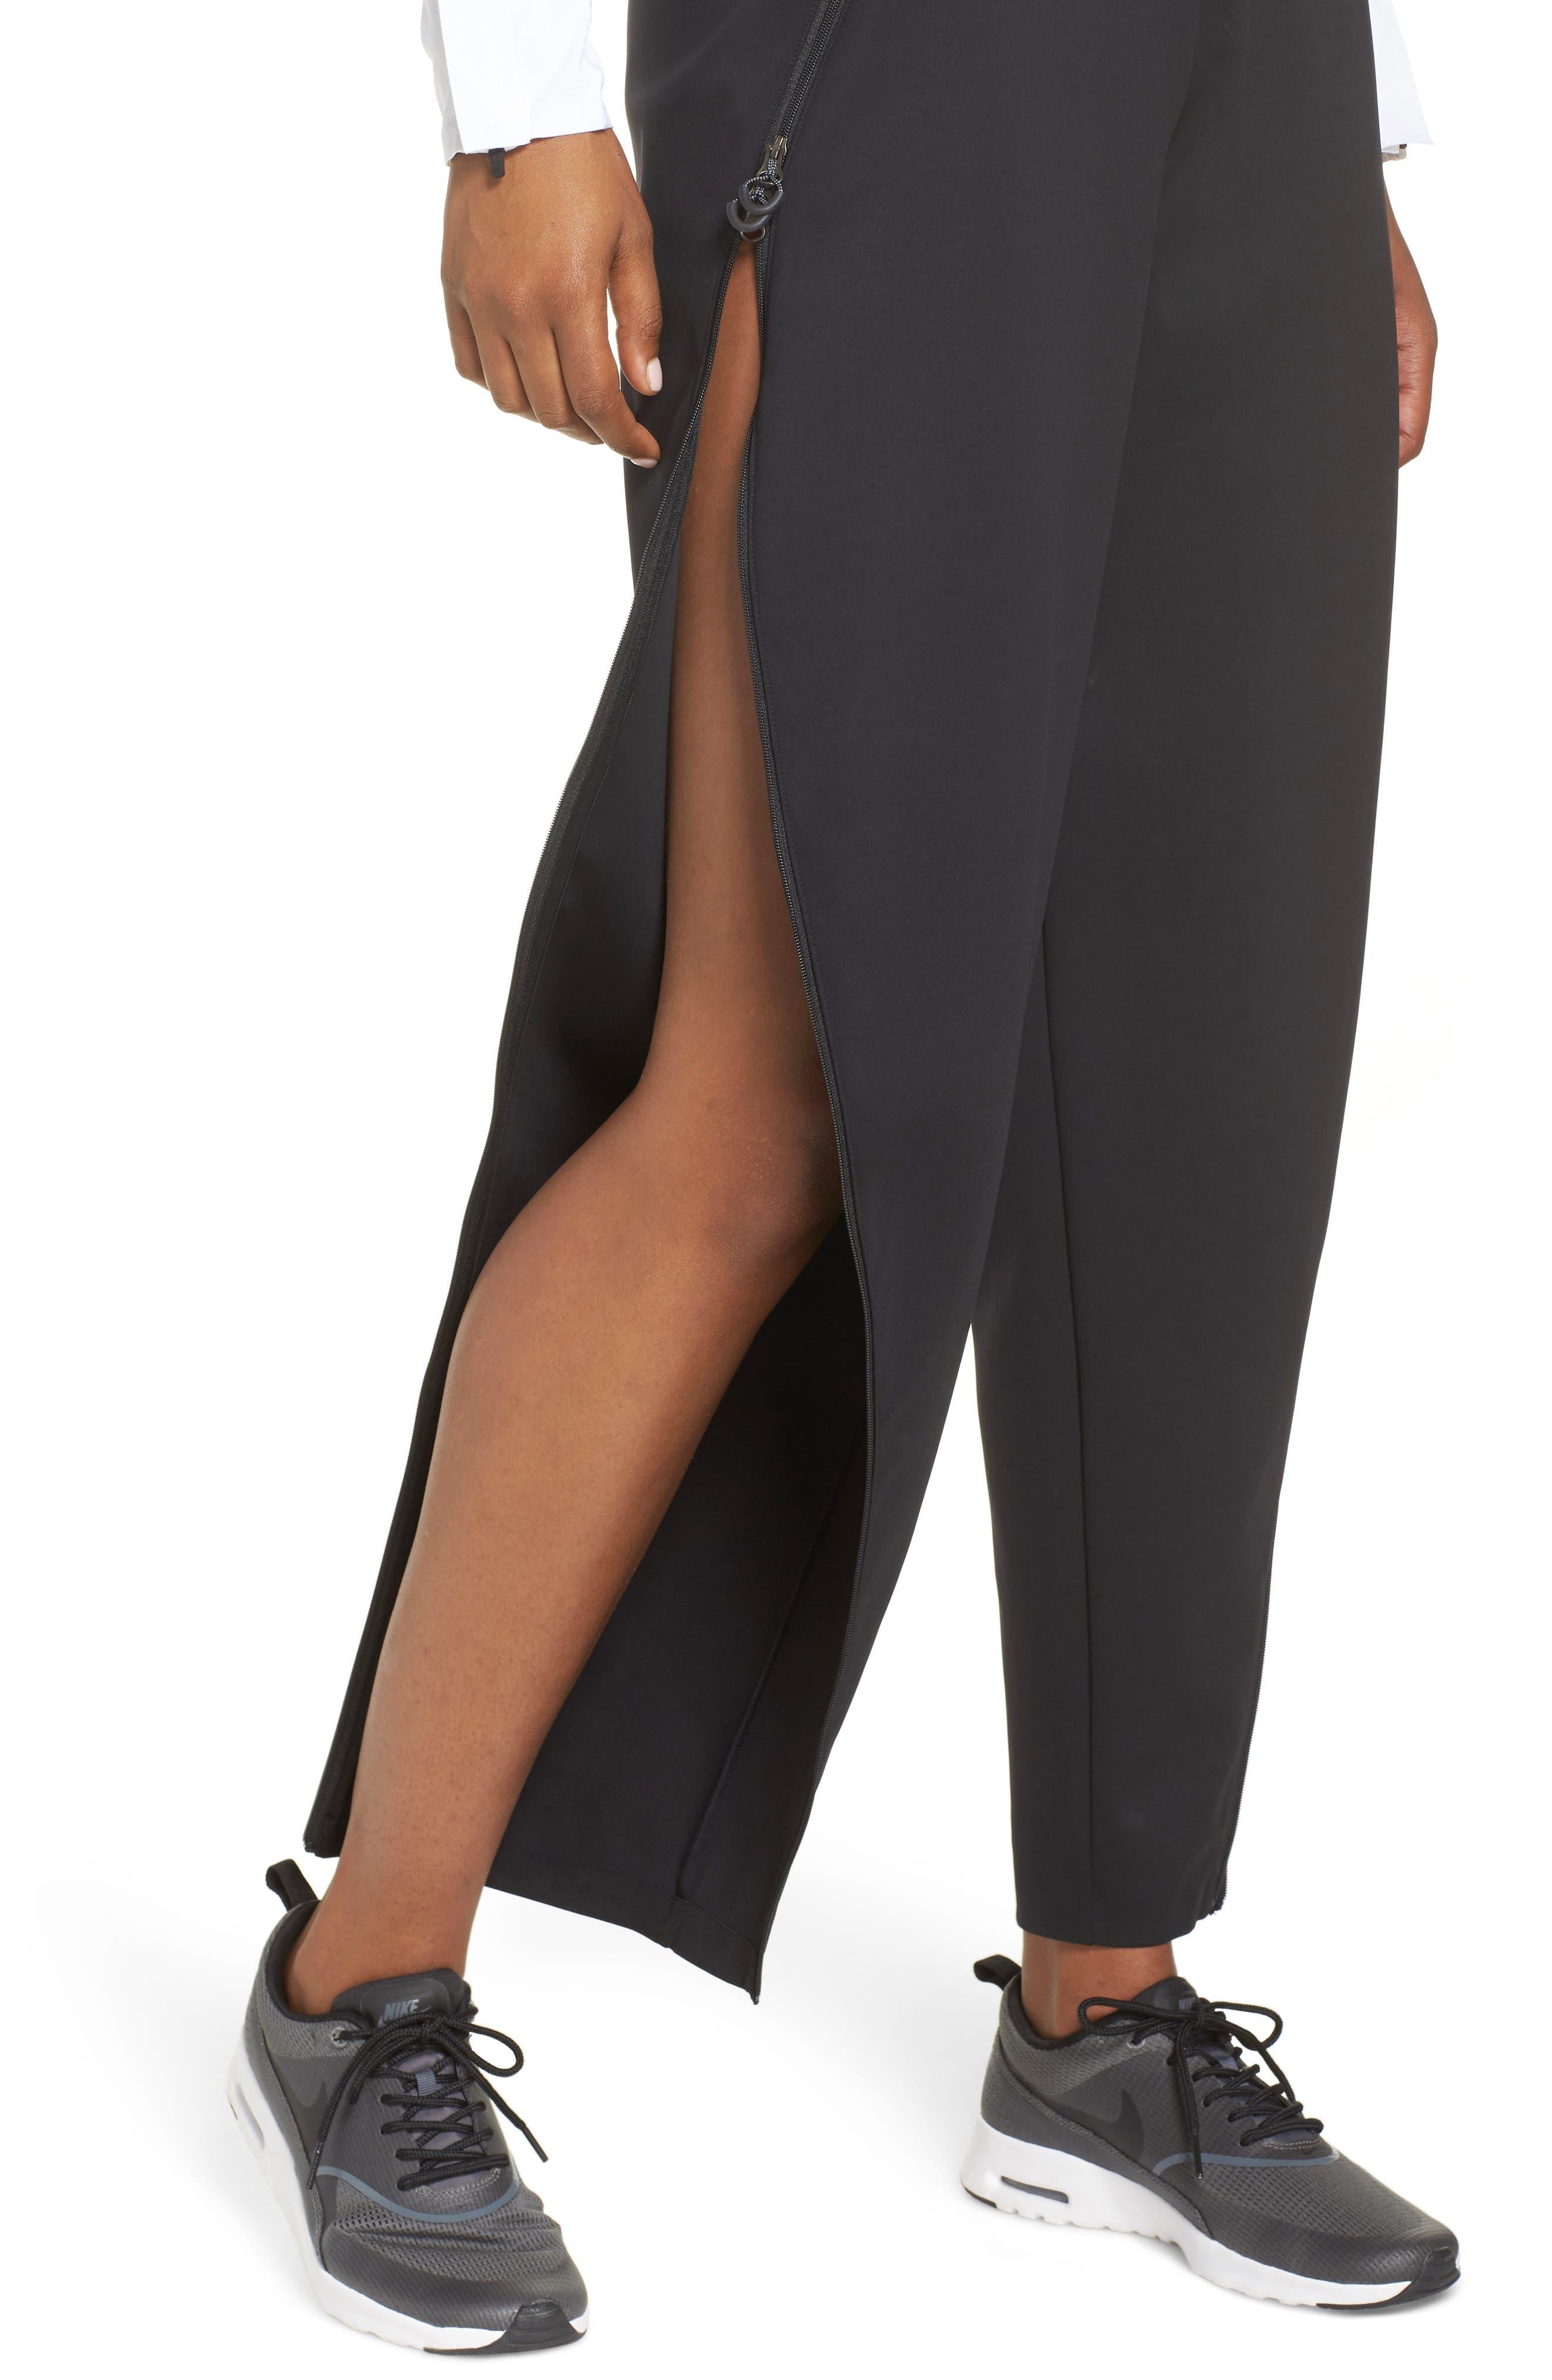 XX Project Women's Dri-FIT Training Pants,                             Alternate thumbnail 4, color,                             BLACK